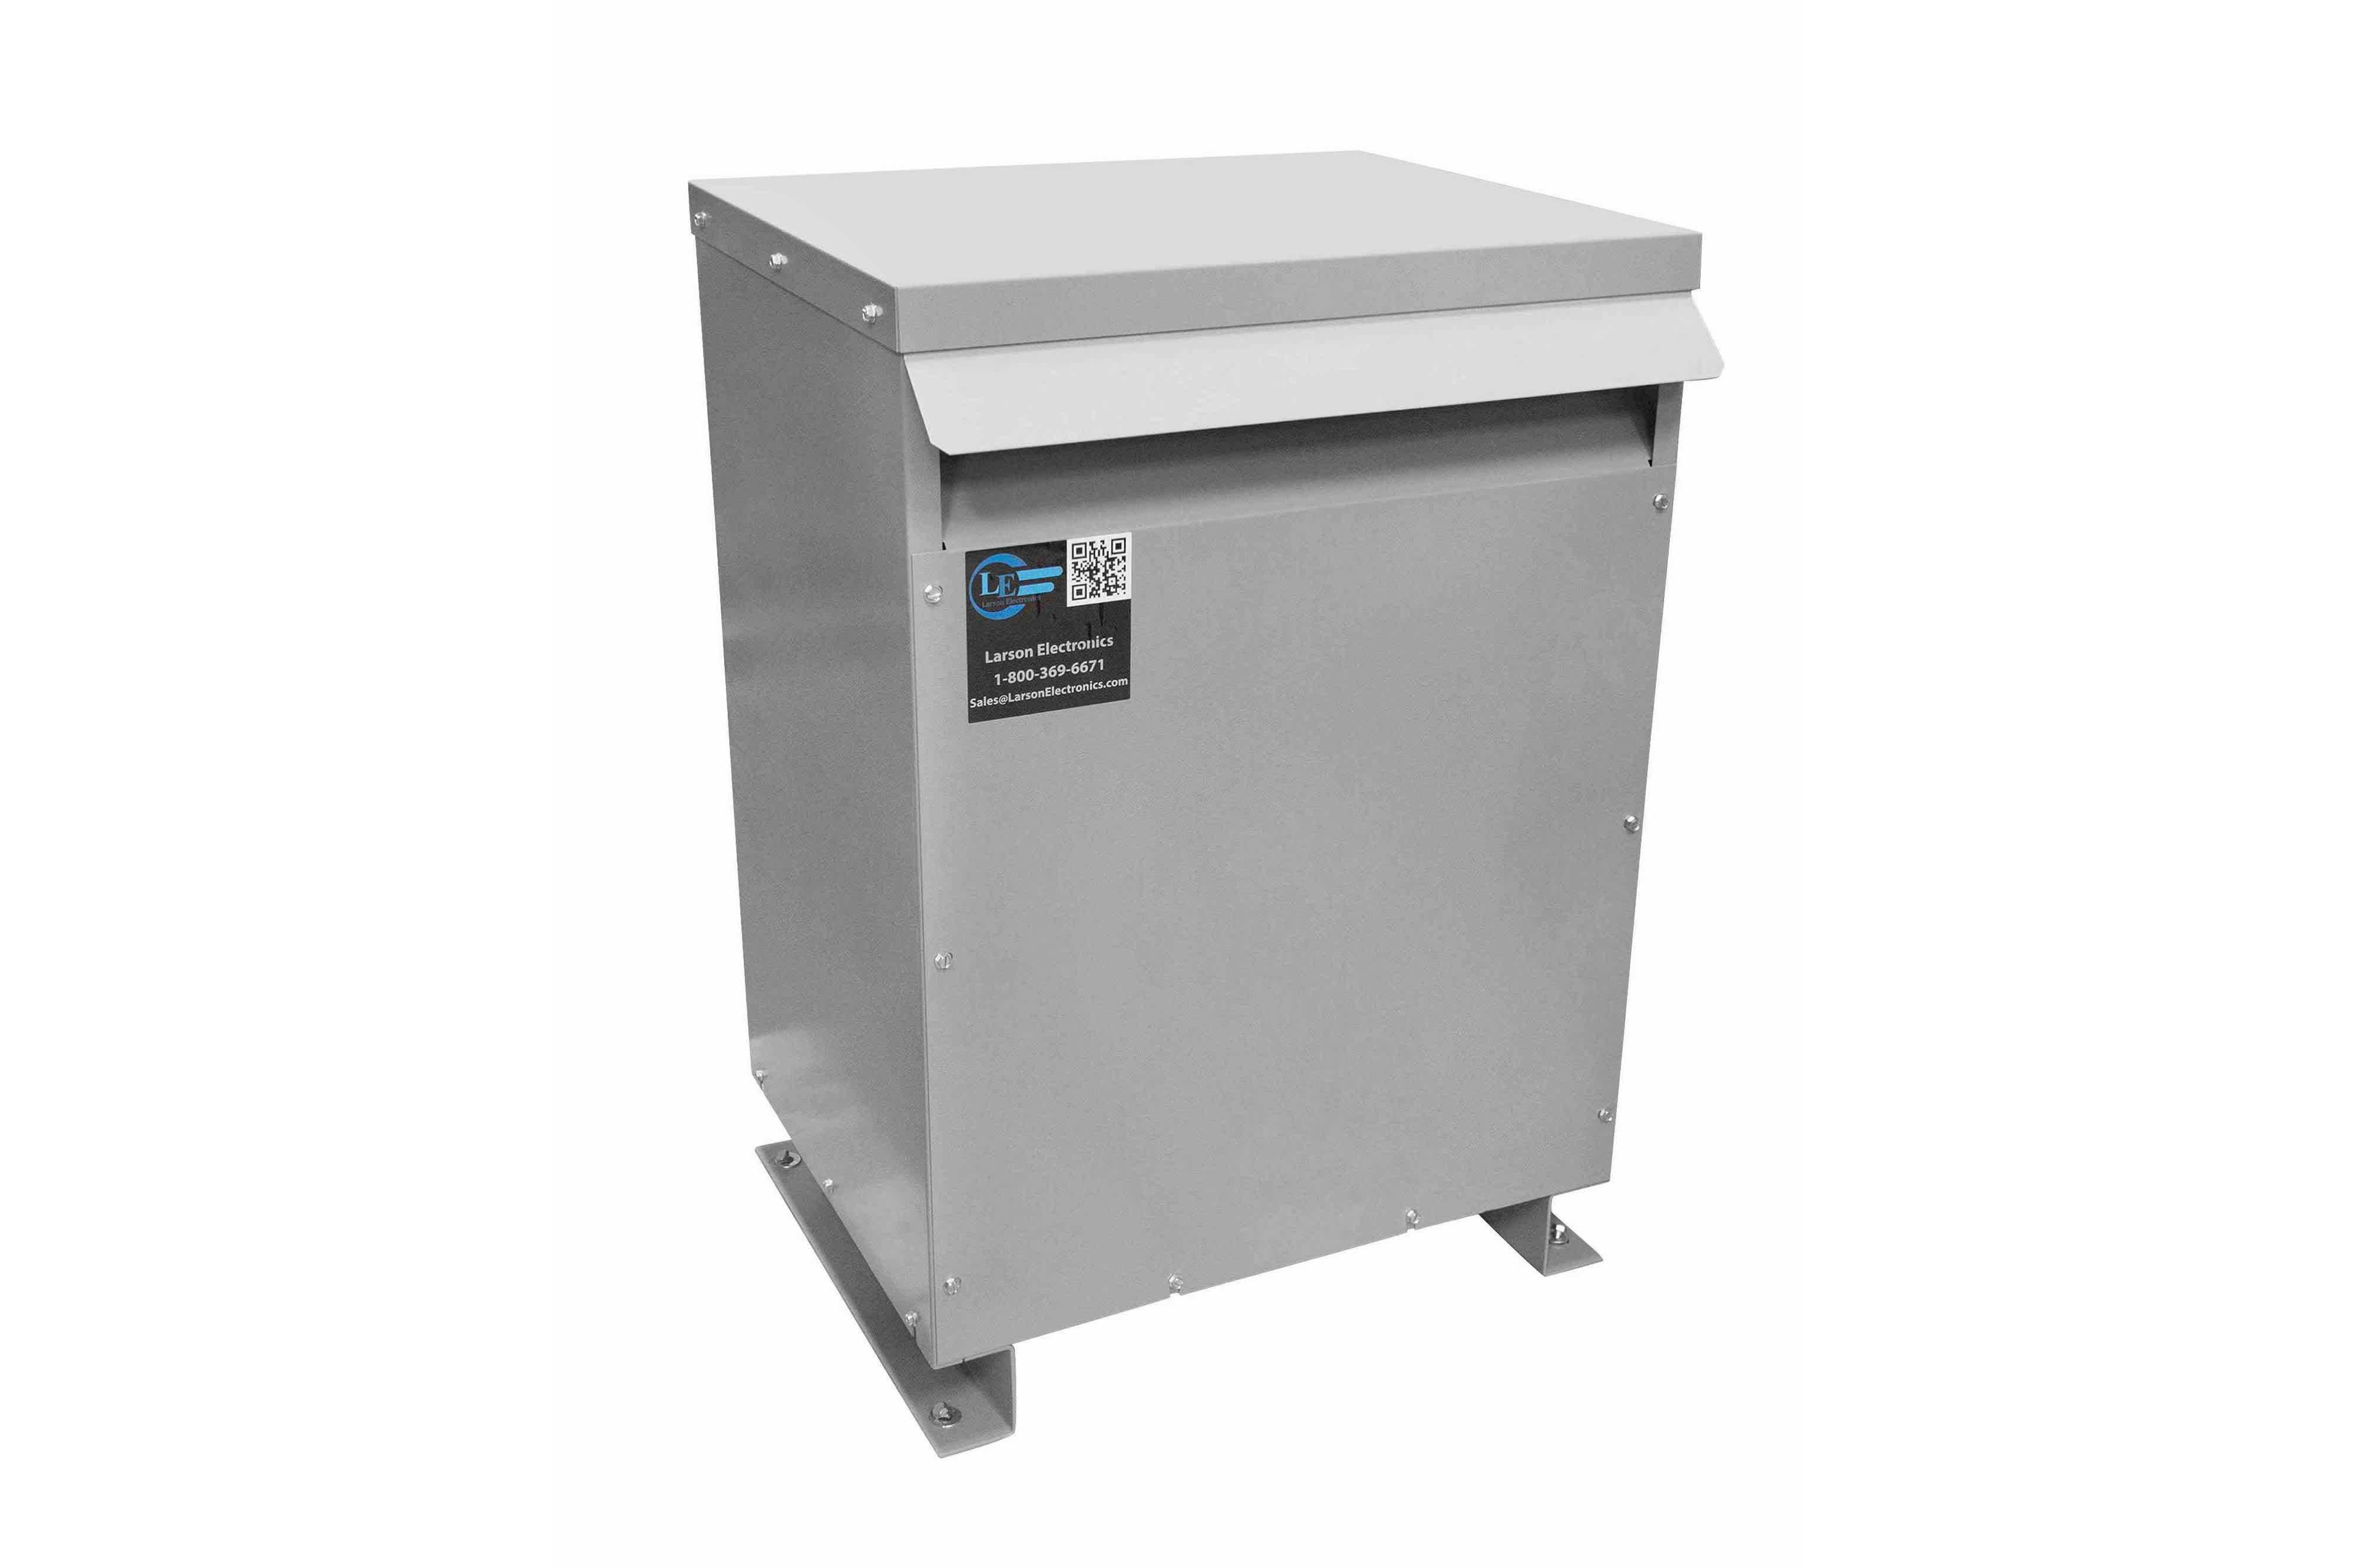 600 kVA 3PH Isolation Transformer, 600V Wye Primary, 240V/120 Delta Secondary, N3R, Ventilated, 60 Hz